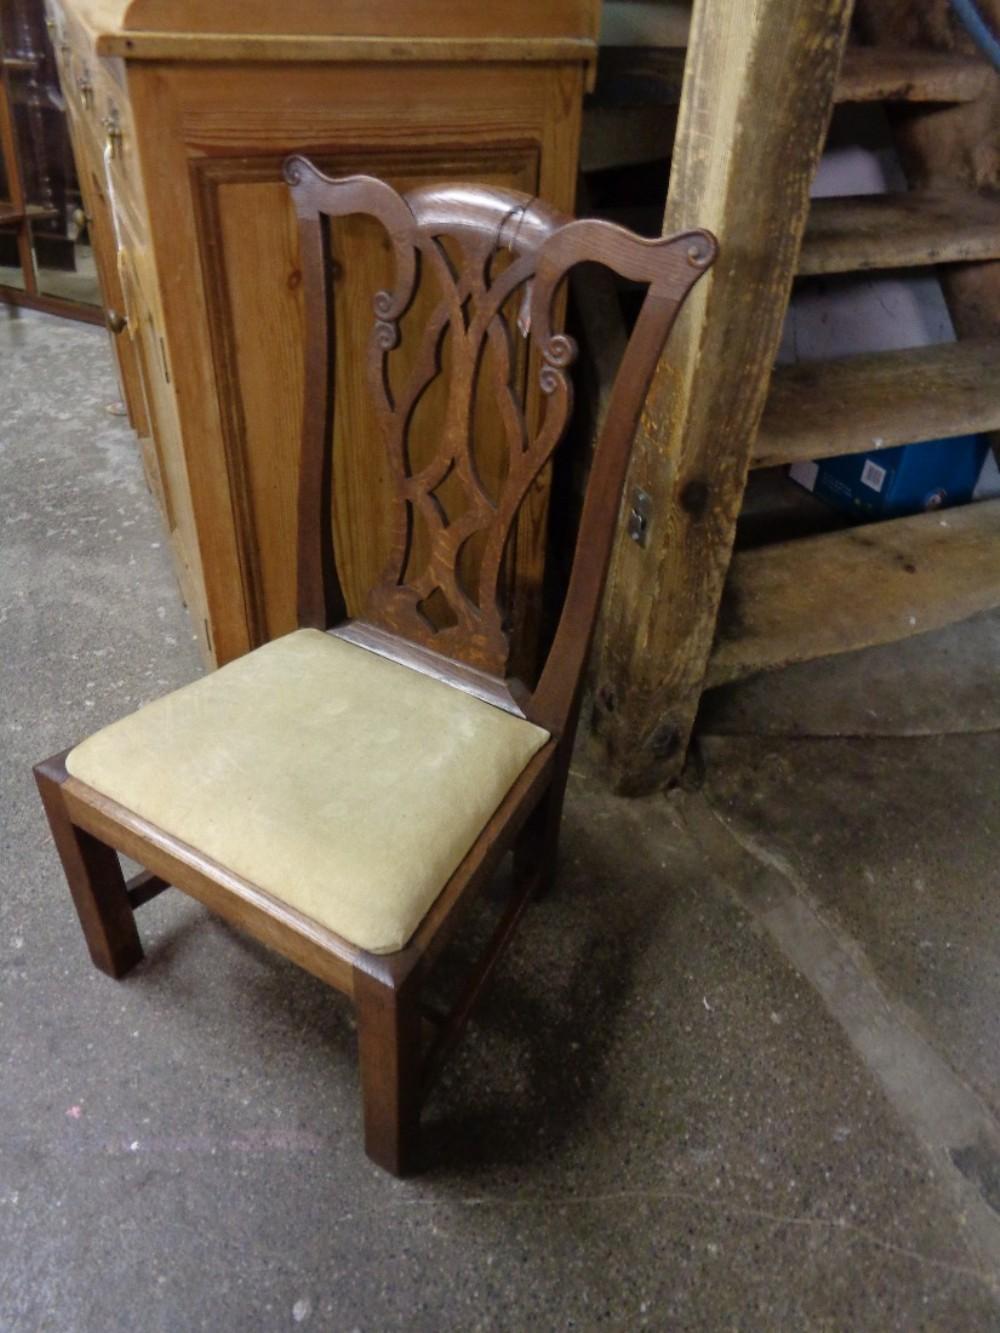 antique oak gossip chair - Antique Oak Gossip Chair 411298 Sellingantiques.co.uk